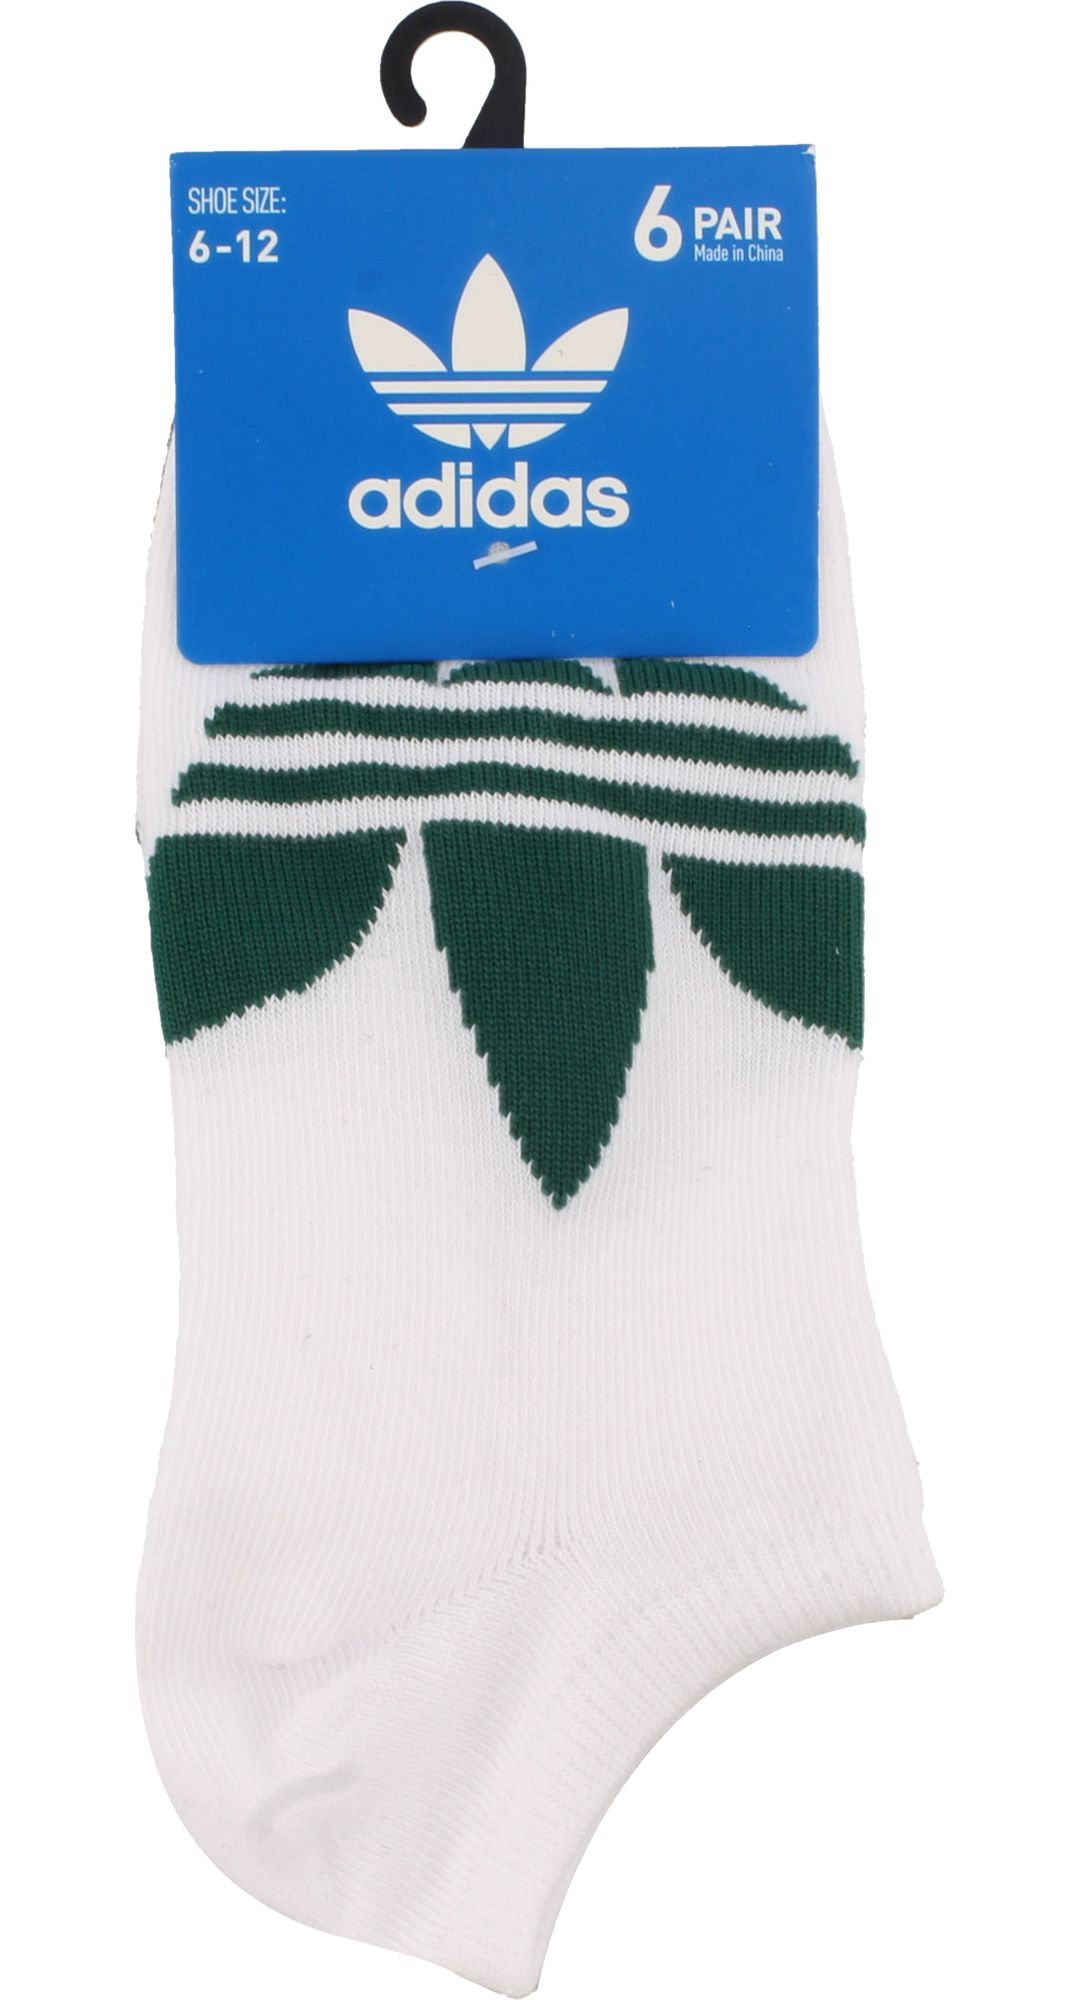 a22d41310d adidas Men's Originals Trefoil Superlite No Show Socks 6 Pack